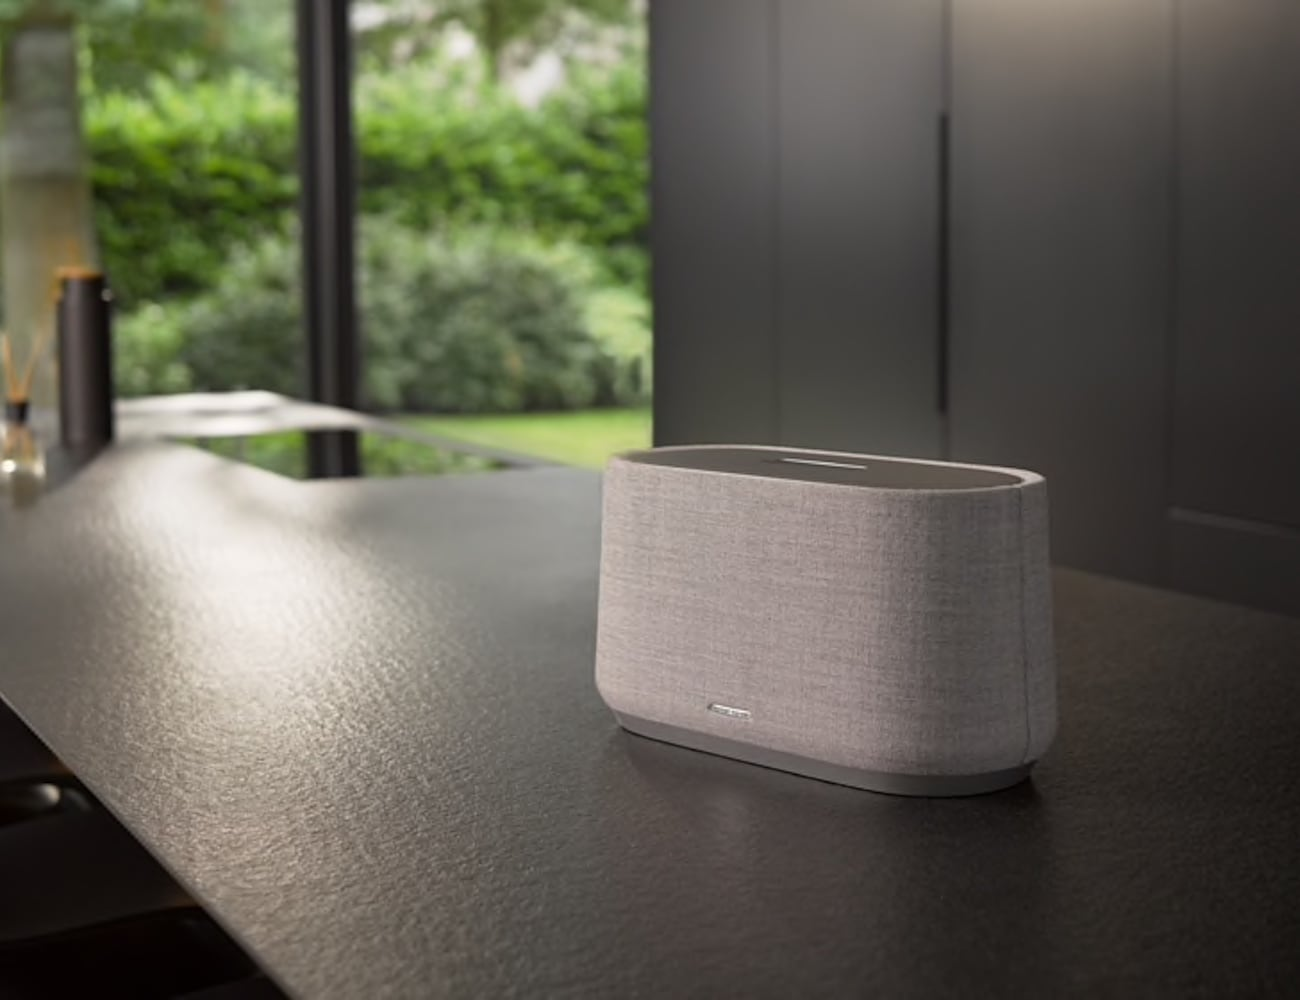 Harman Kardon Citation 500 Smart Home Speaker